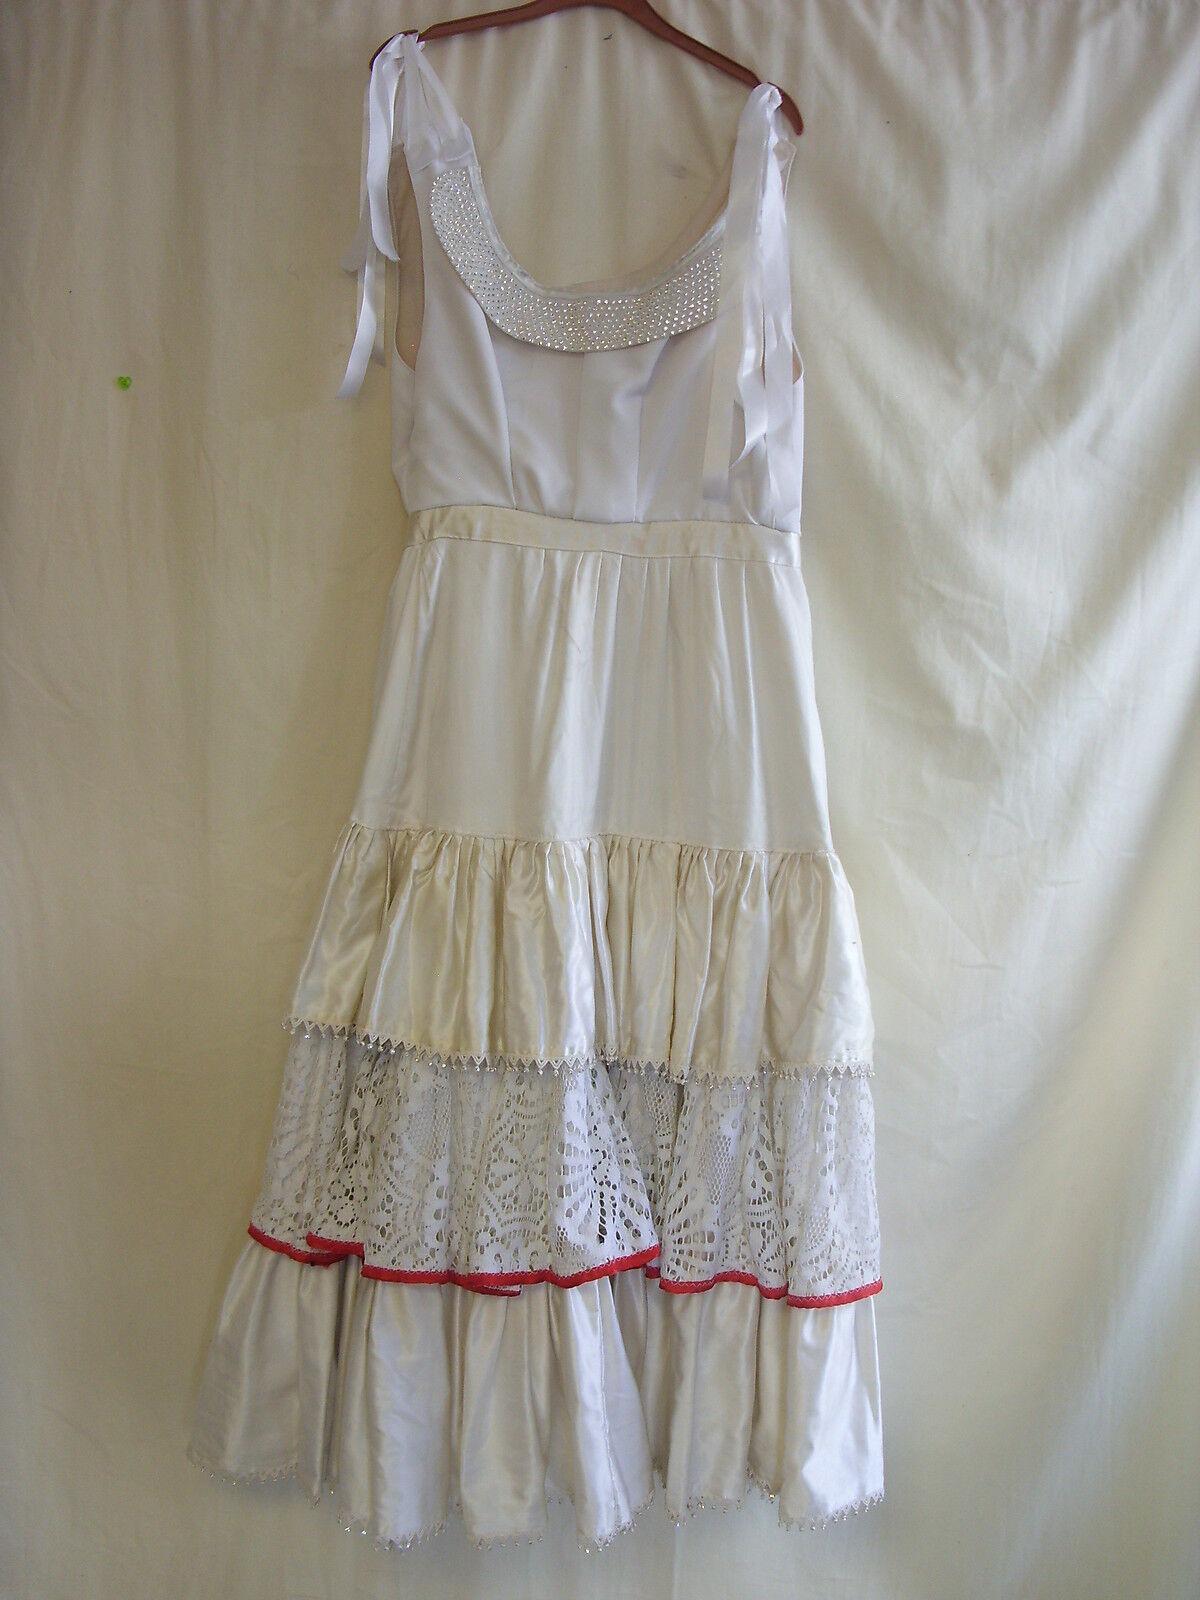 Womens Fancy Dress - Wedding, theatre, drama, princess, royalty, cream - 2484